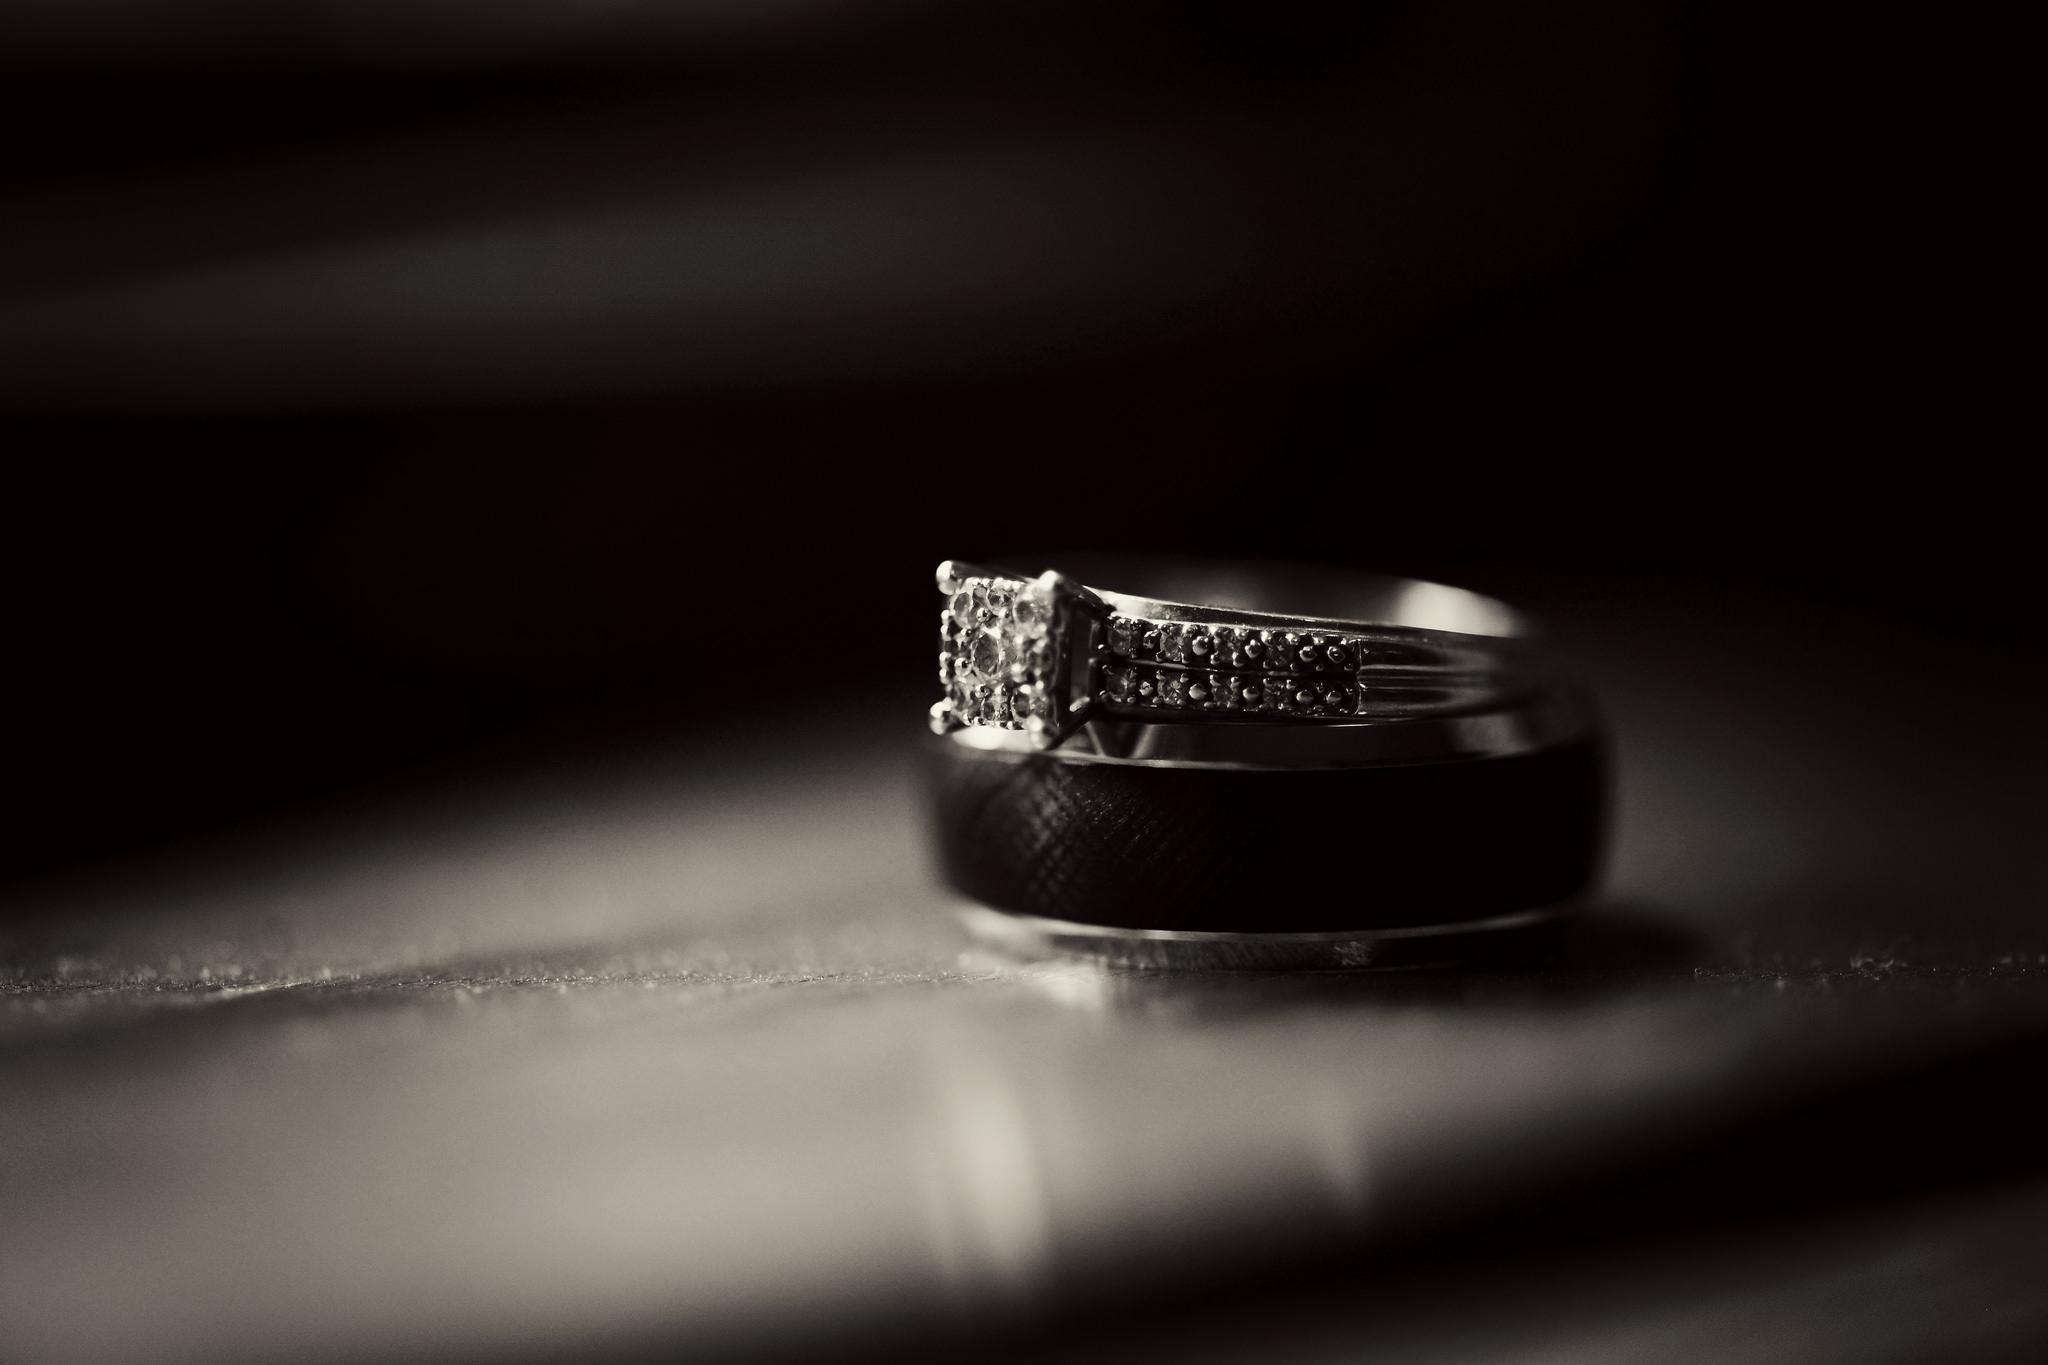 kristine_wedding_rings_spiritedtable_photo13.jpg